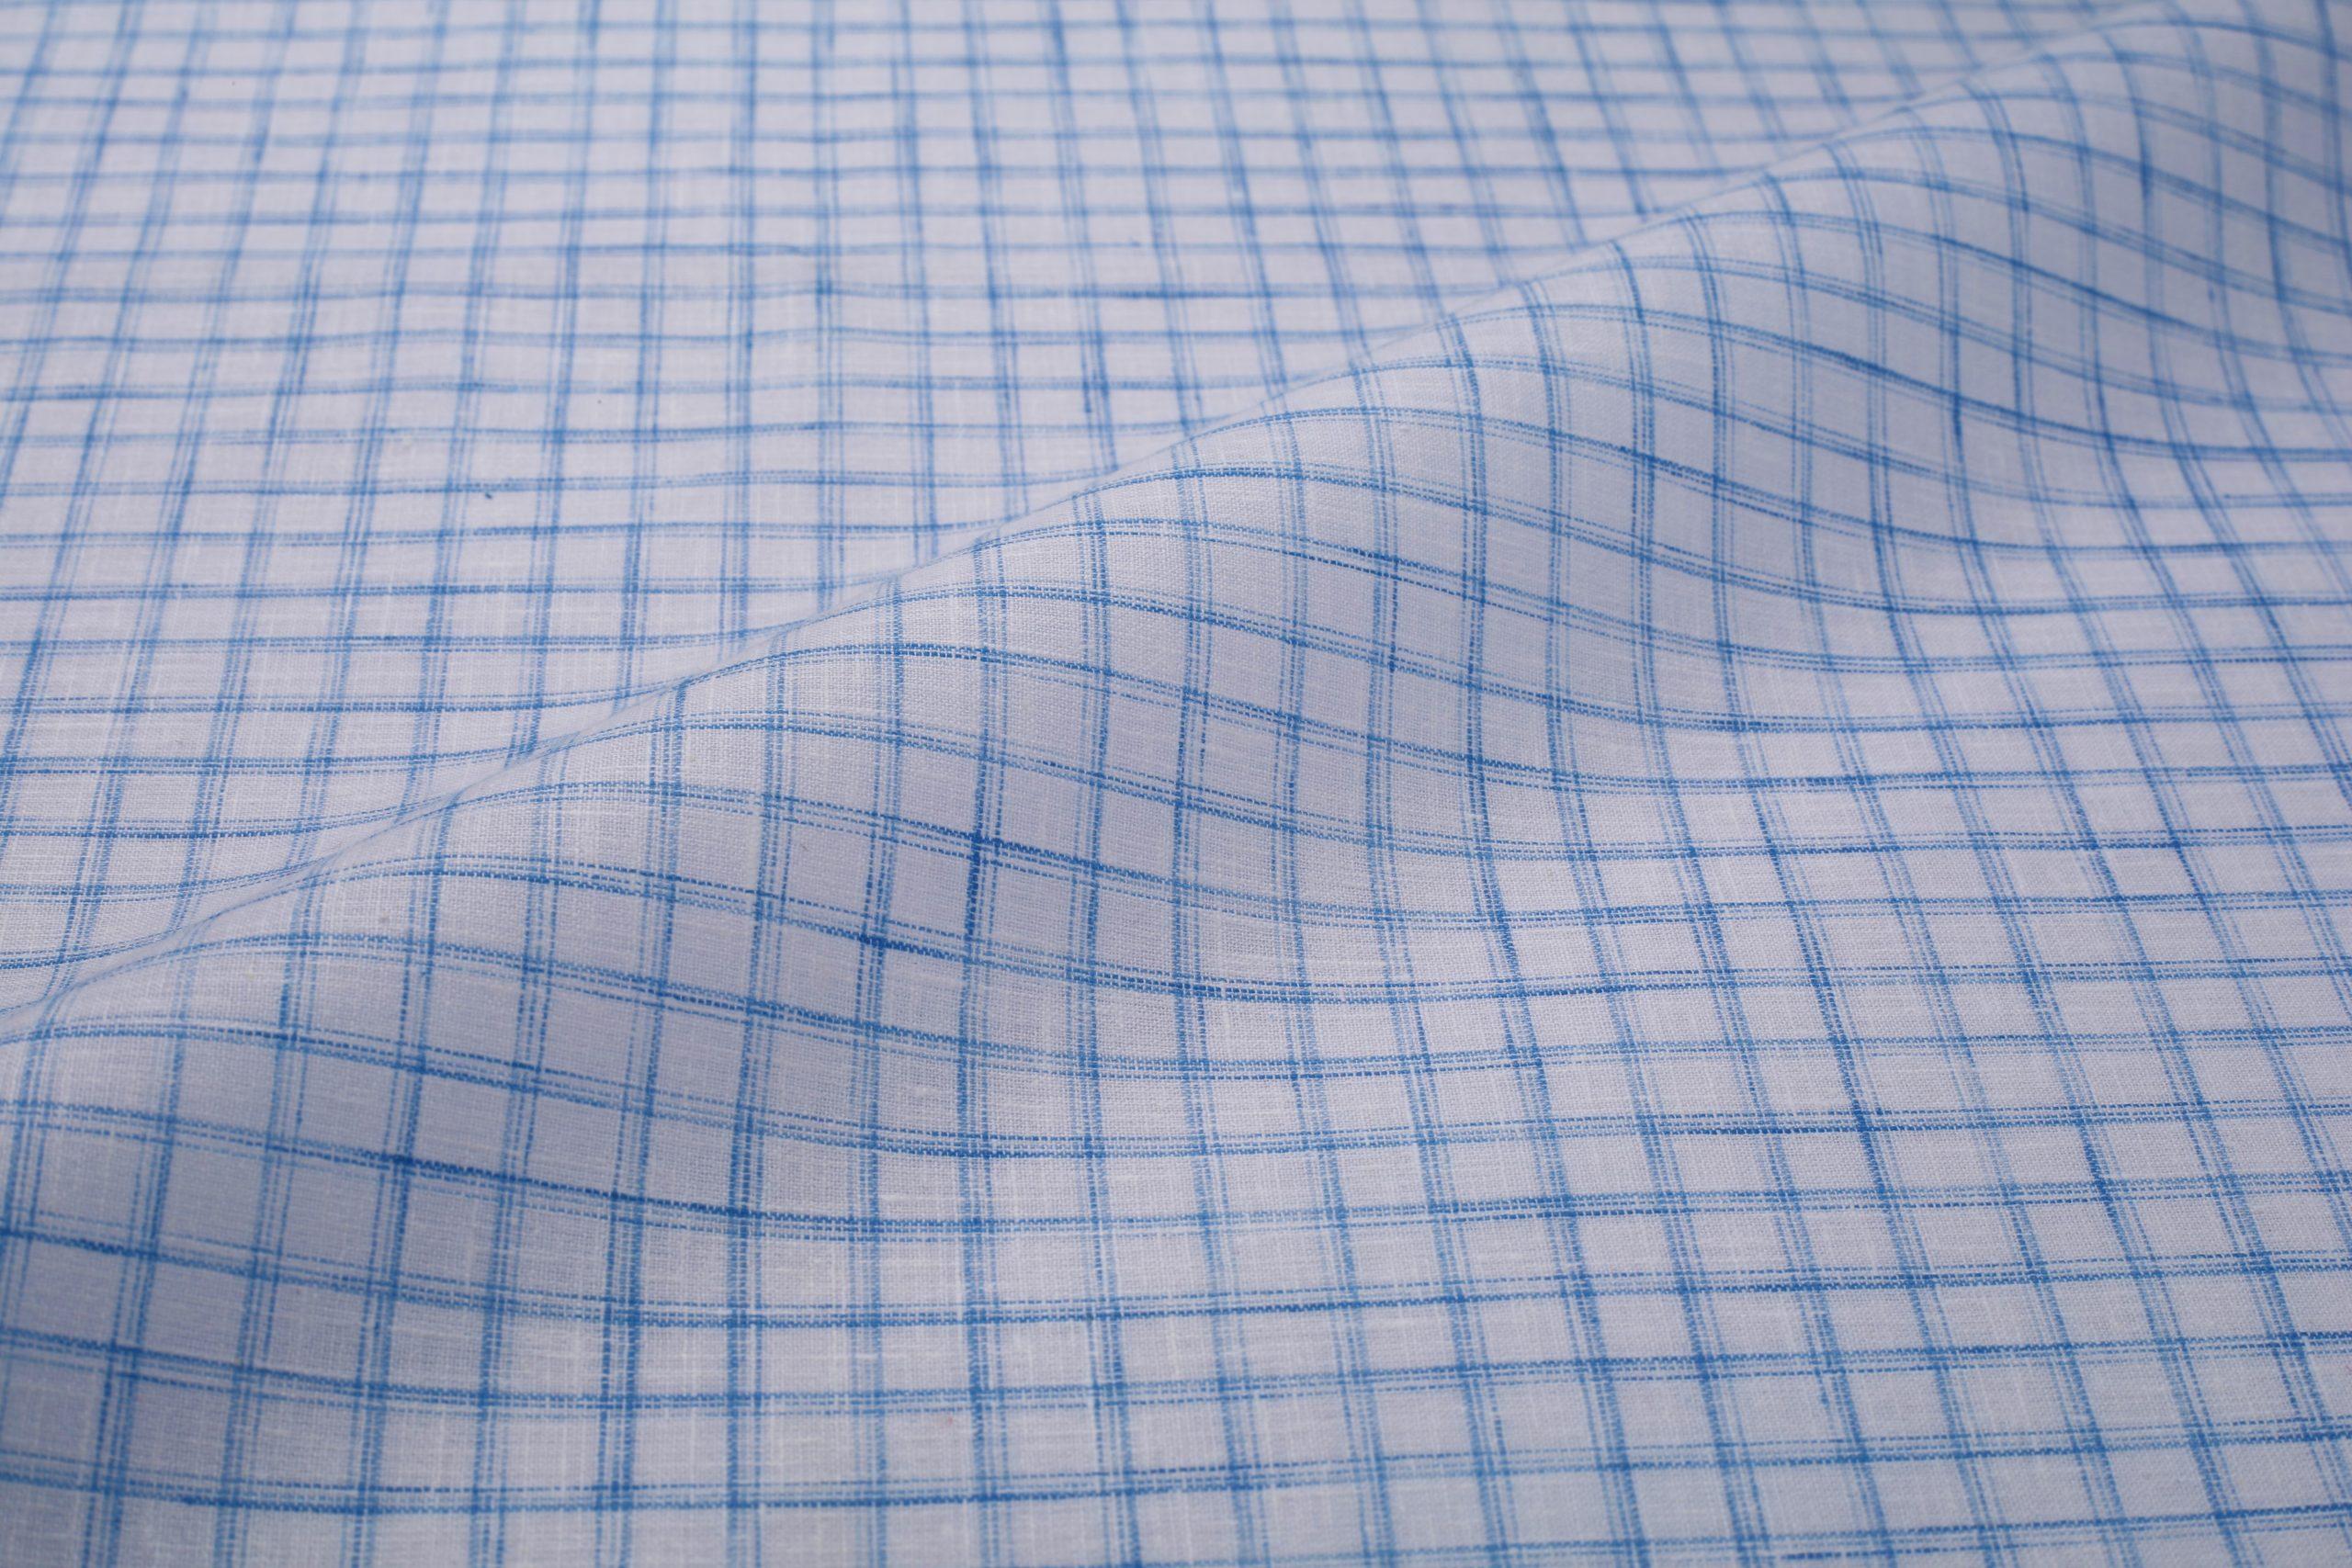 casual check shirt fabric